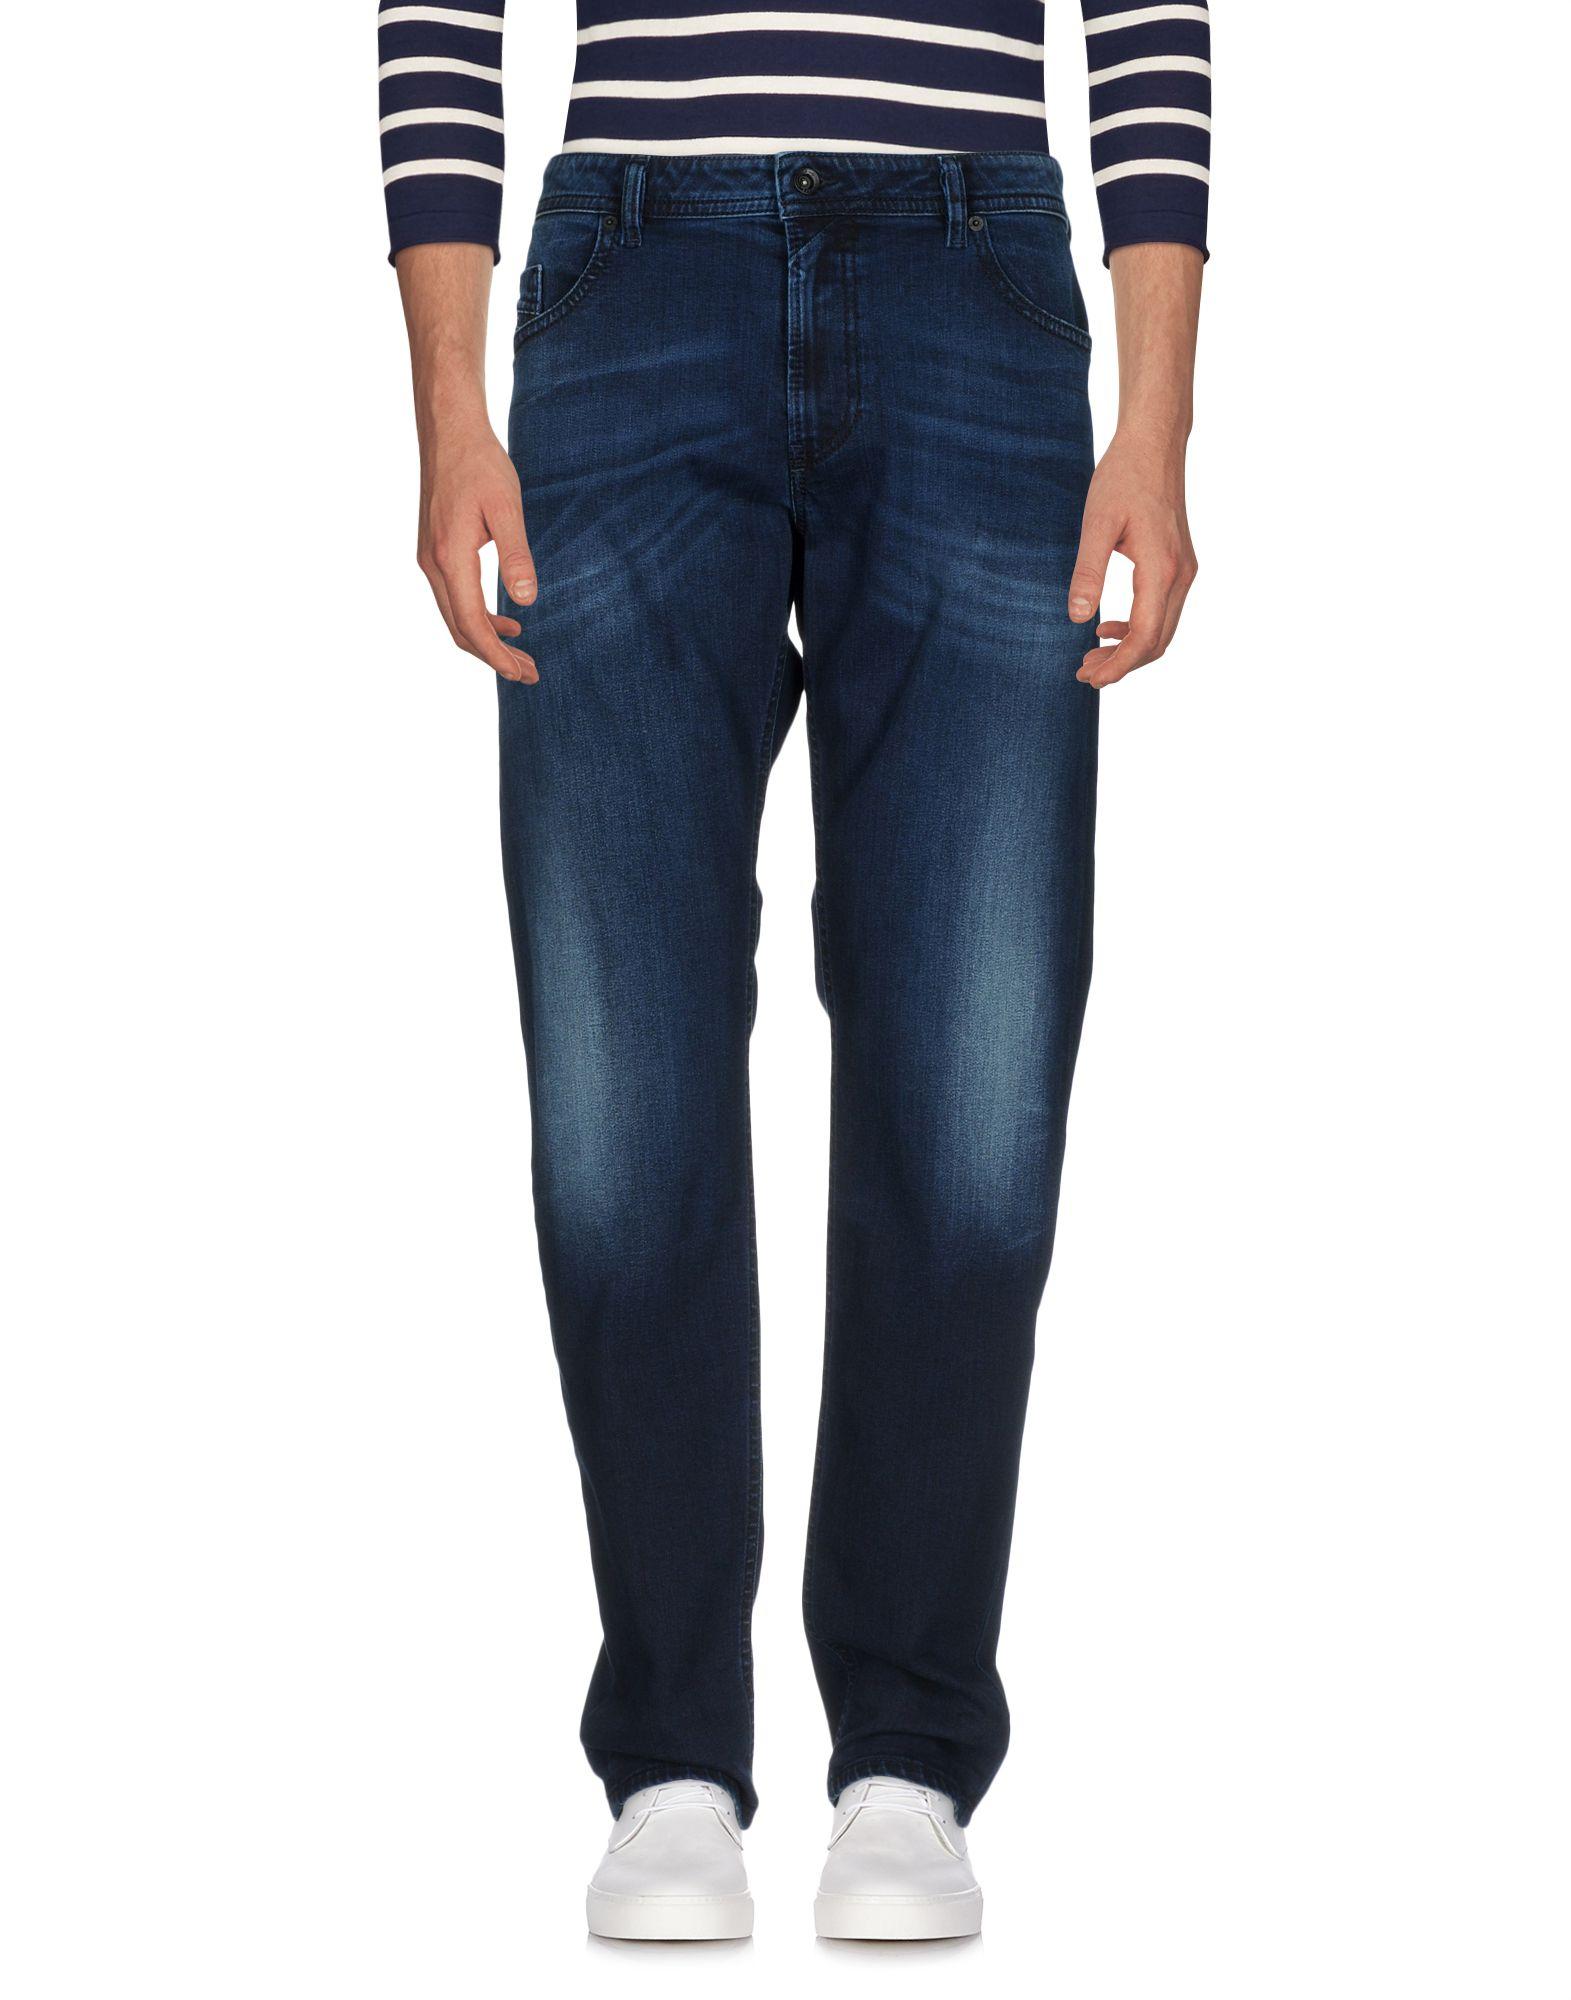 Pantaloni Pantaloni Pantaloni Jeans Diesel Uomo - 42653453EQ 83f979